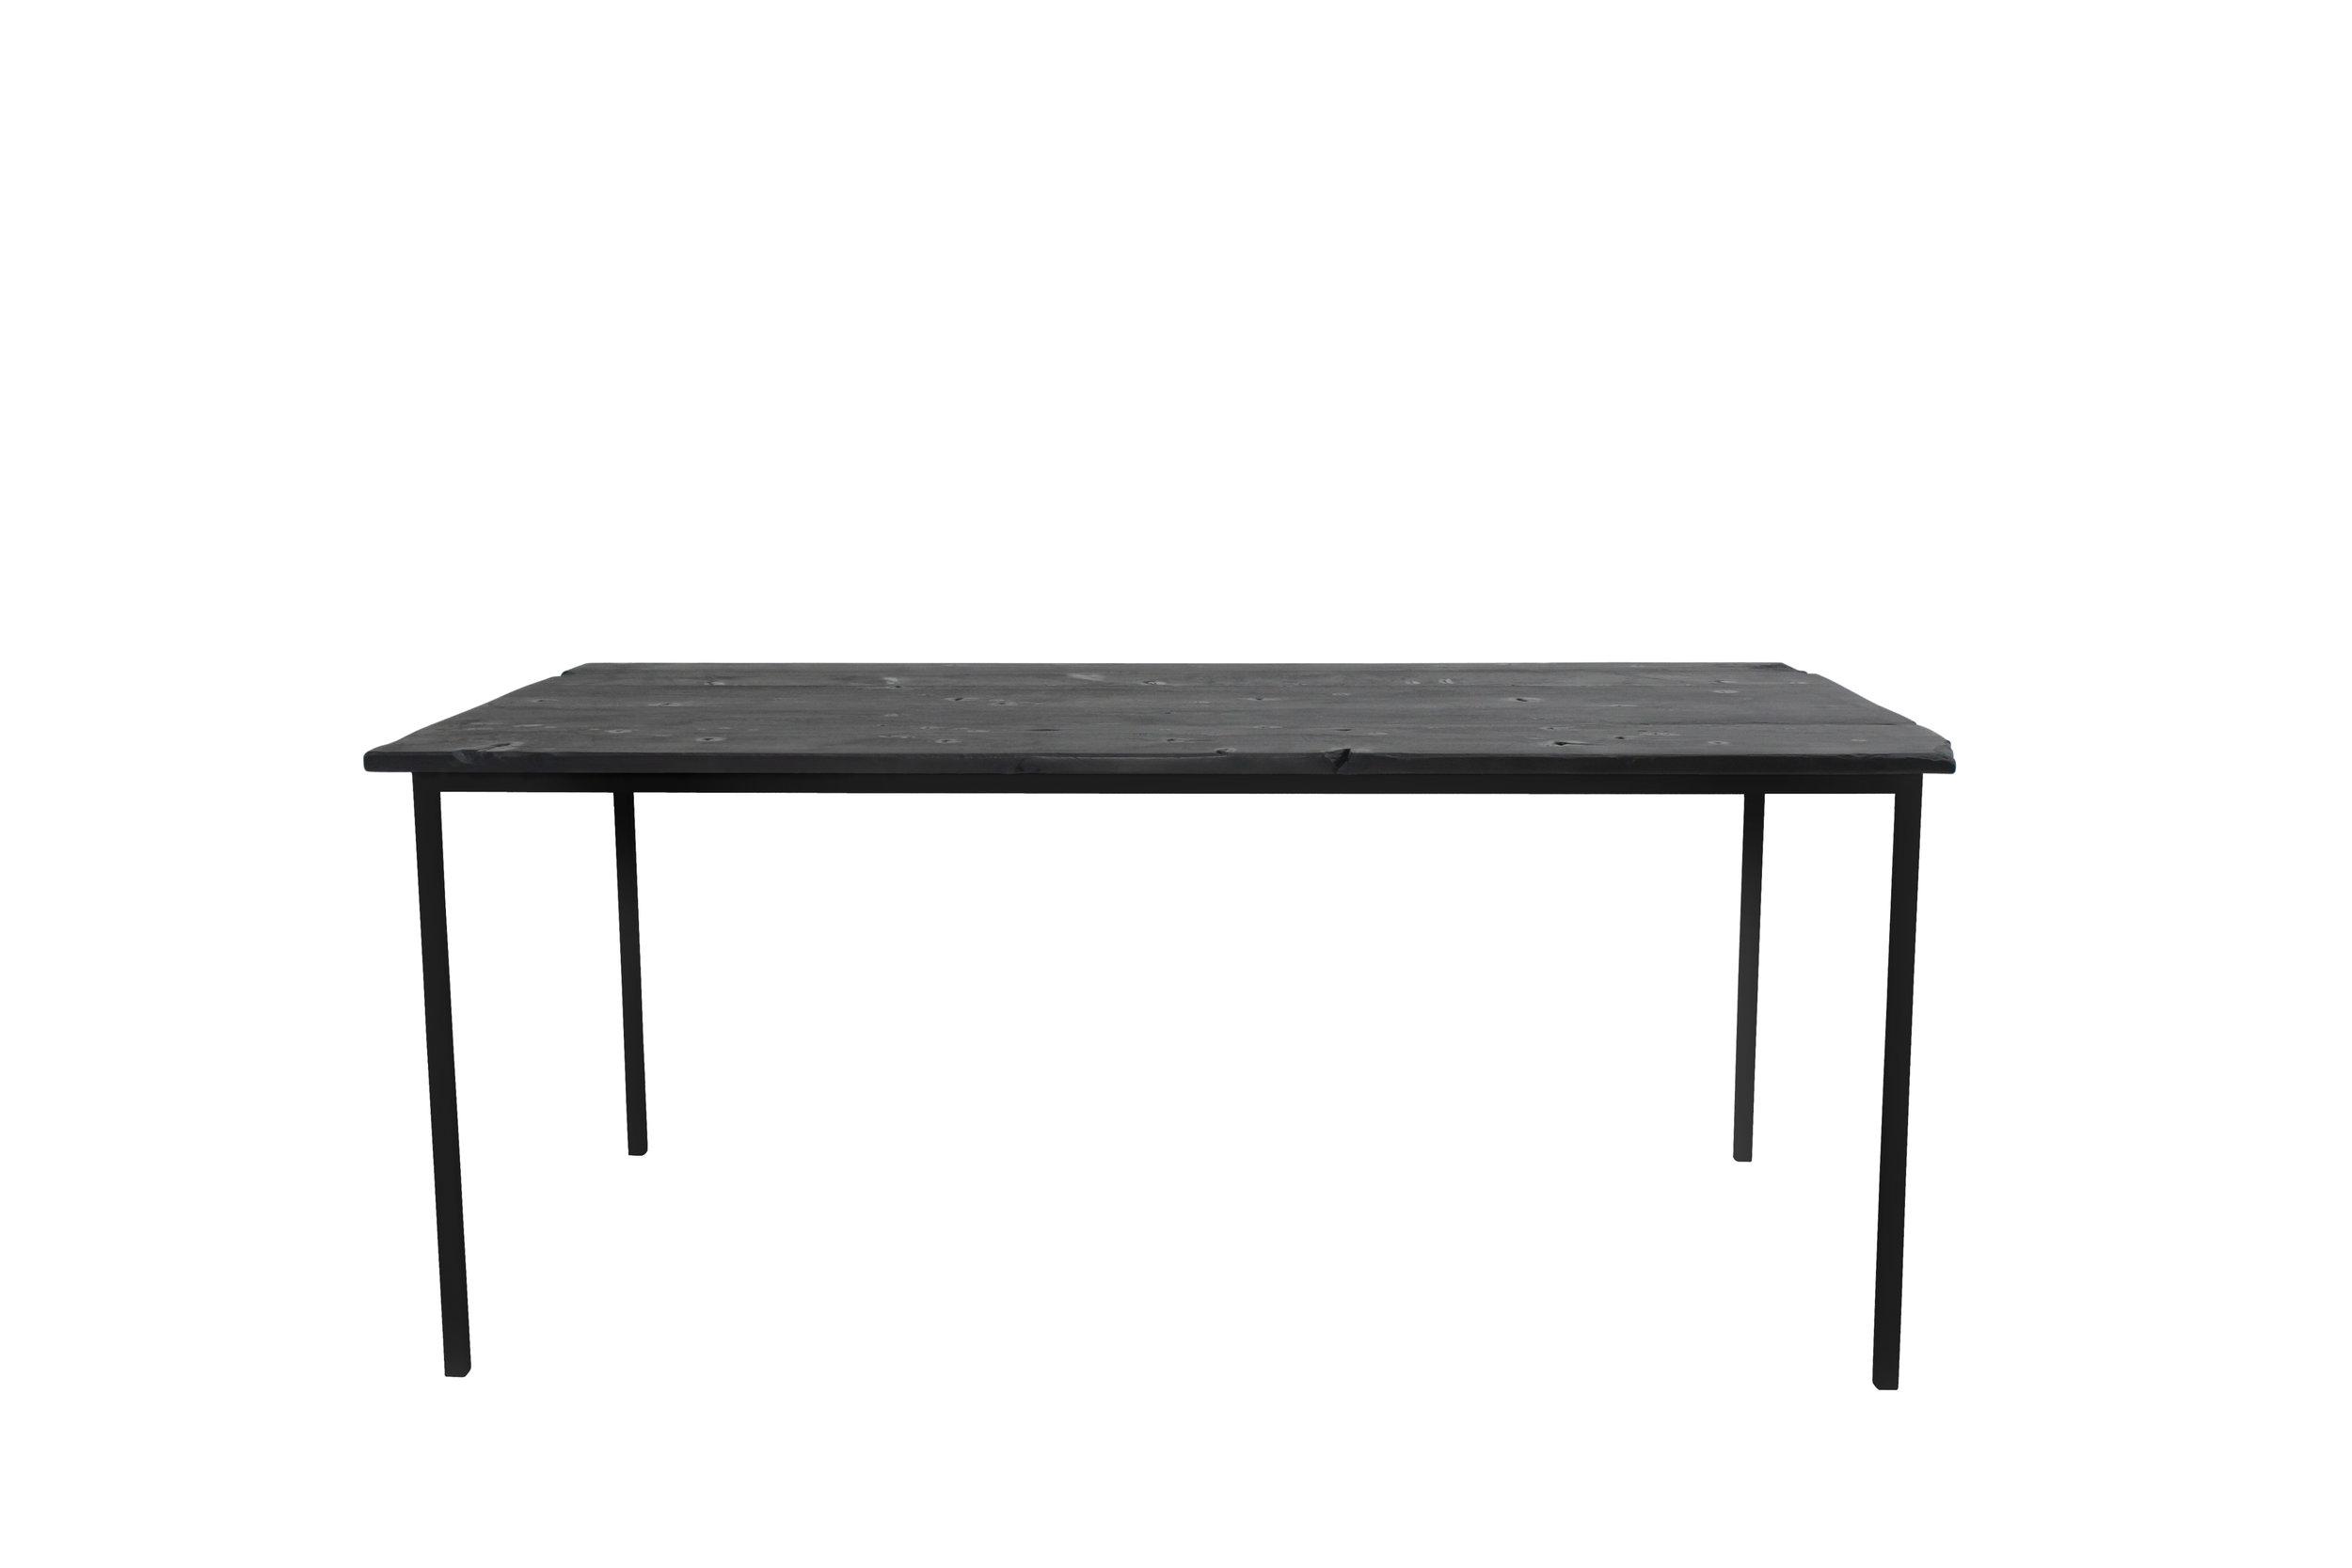 Hephaestus Table_Charred1 black base copy.jpg